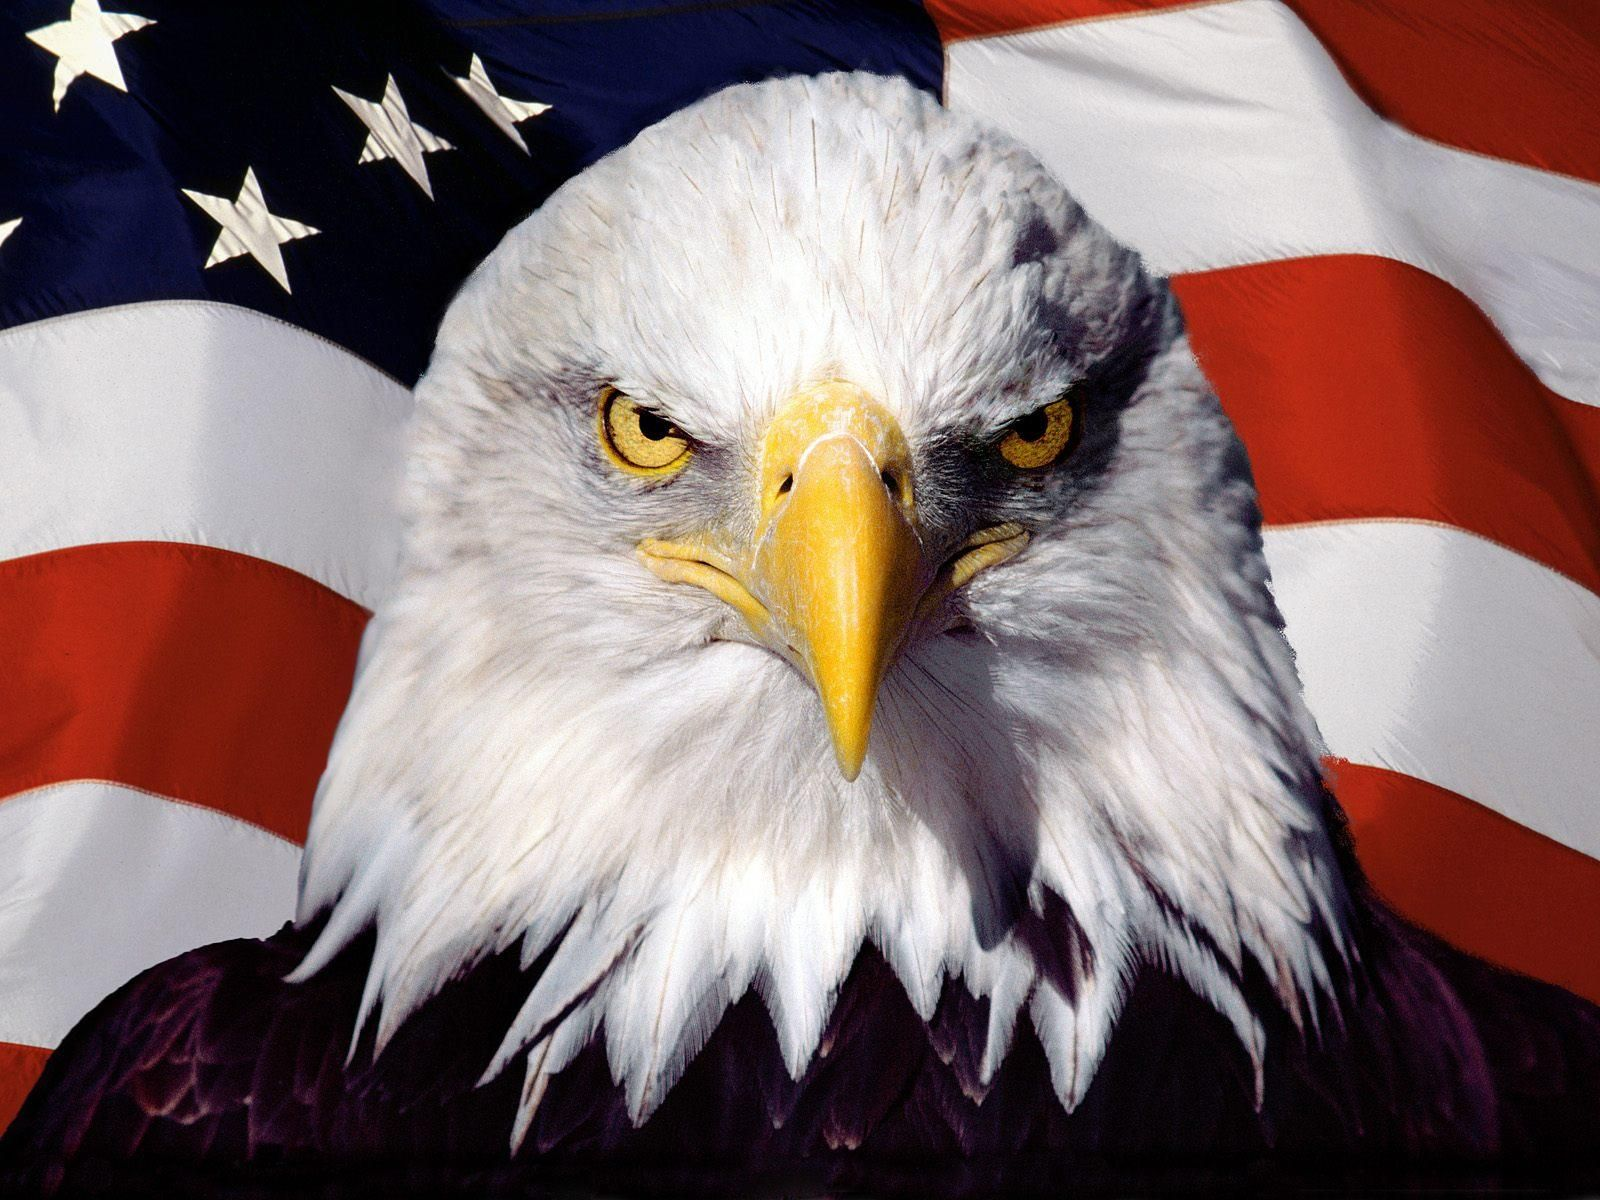 Bald Eagle Wallpapers   Top Free Bald Eagle Backgrounds ...